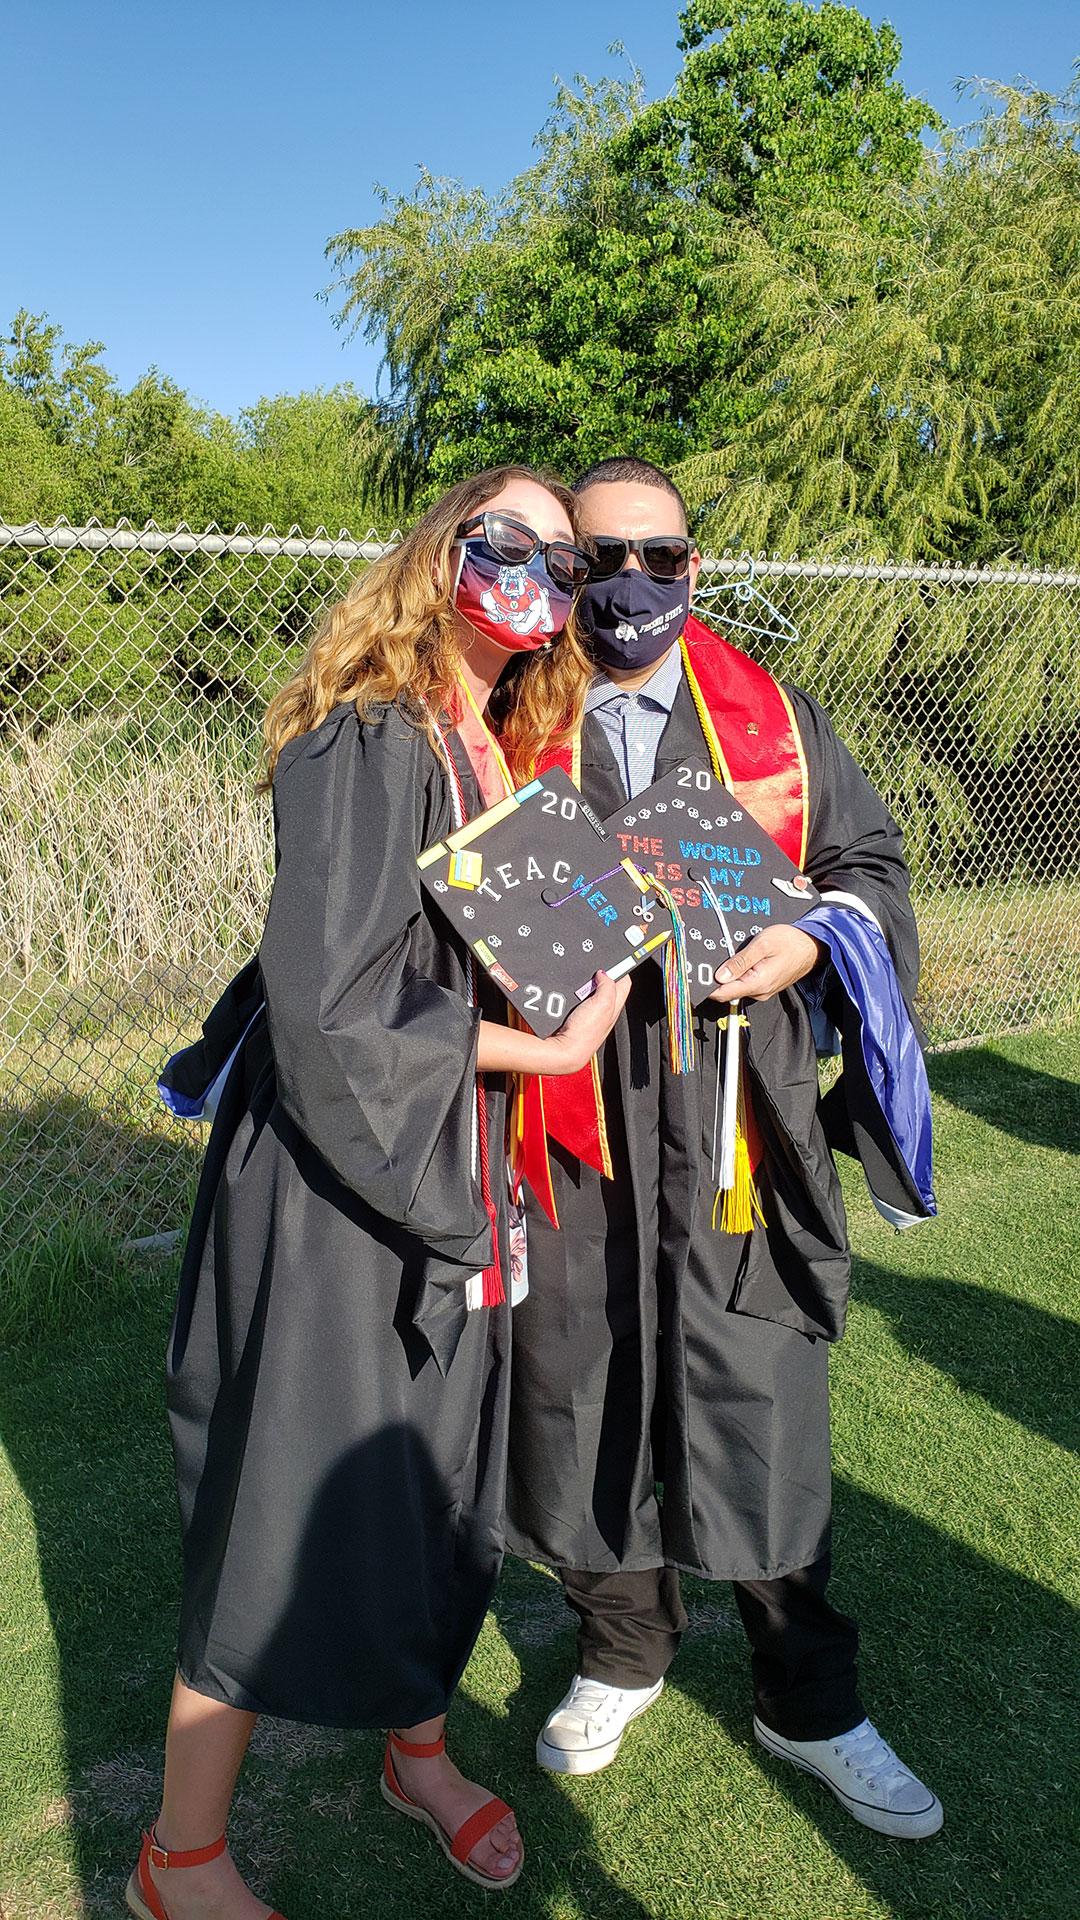 Grads show off their cap decorations.